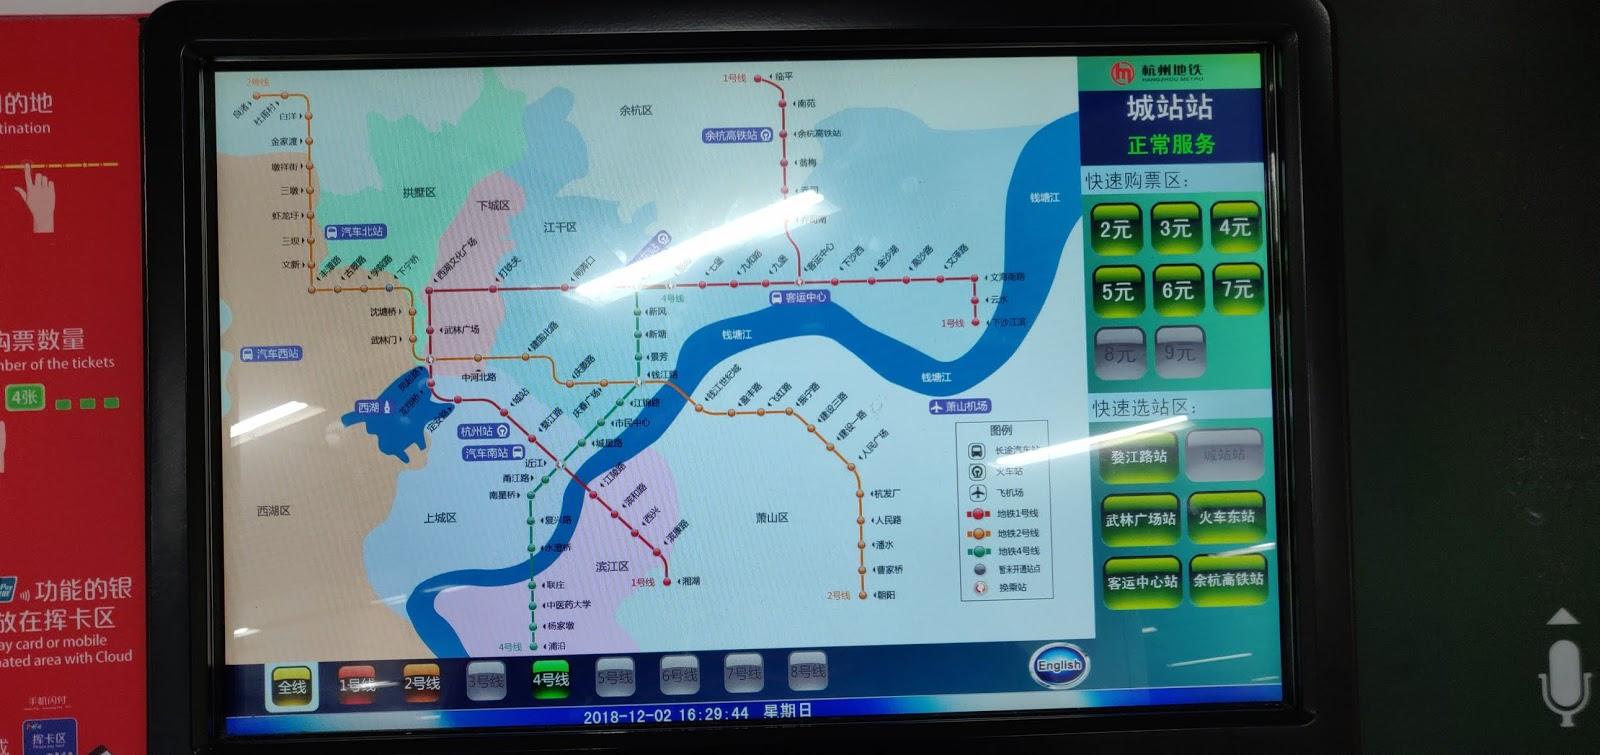 Alex Baar - International Digital Marketing - : The Ultimate Subway